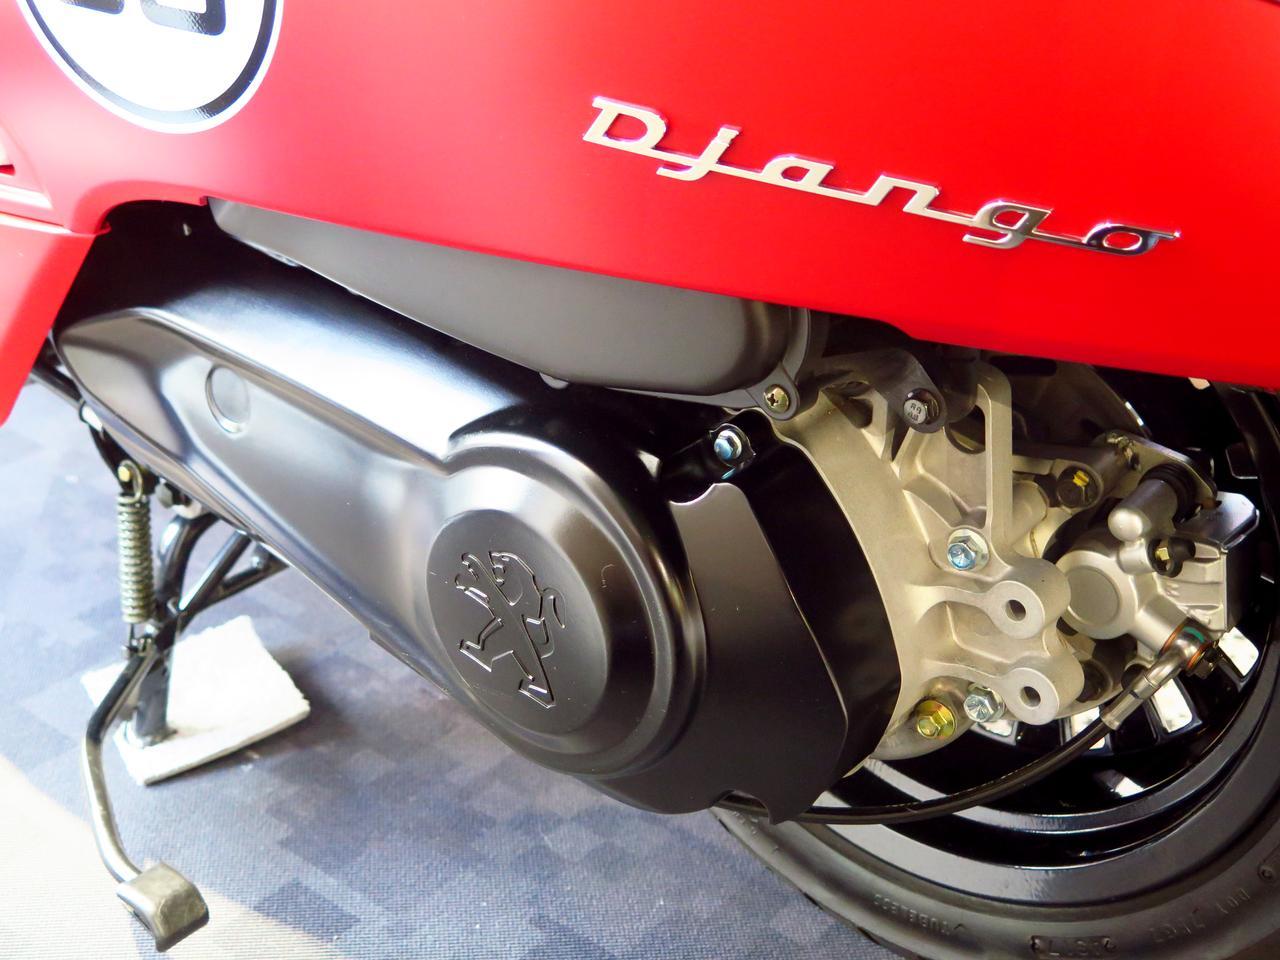 Images : 4番目の画像 - 細部もチェック!! カラーは「ディープオーシャンブルー」もあります。 - webオートバイ